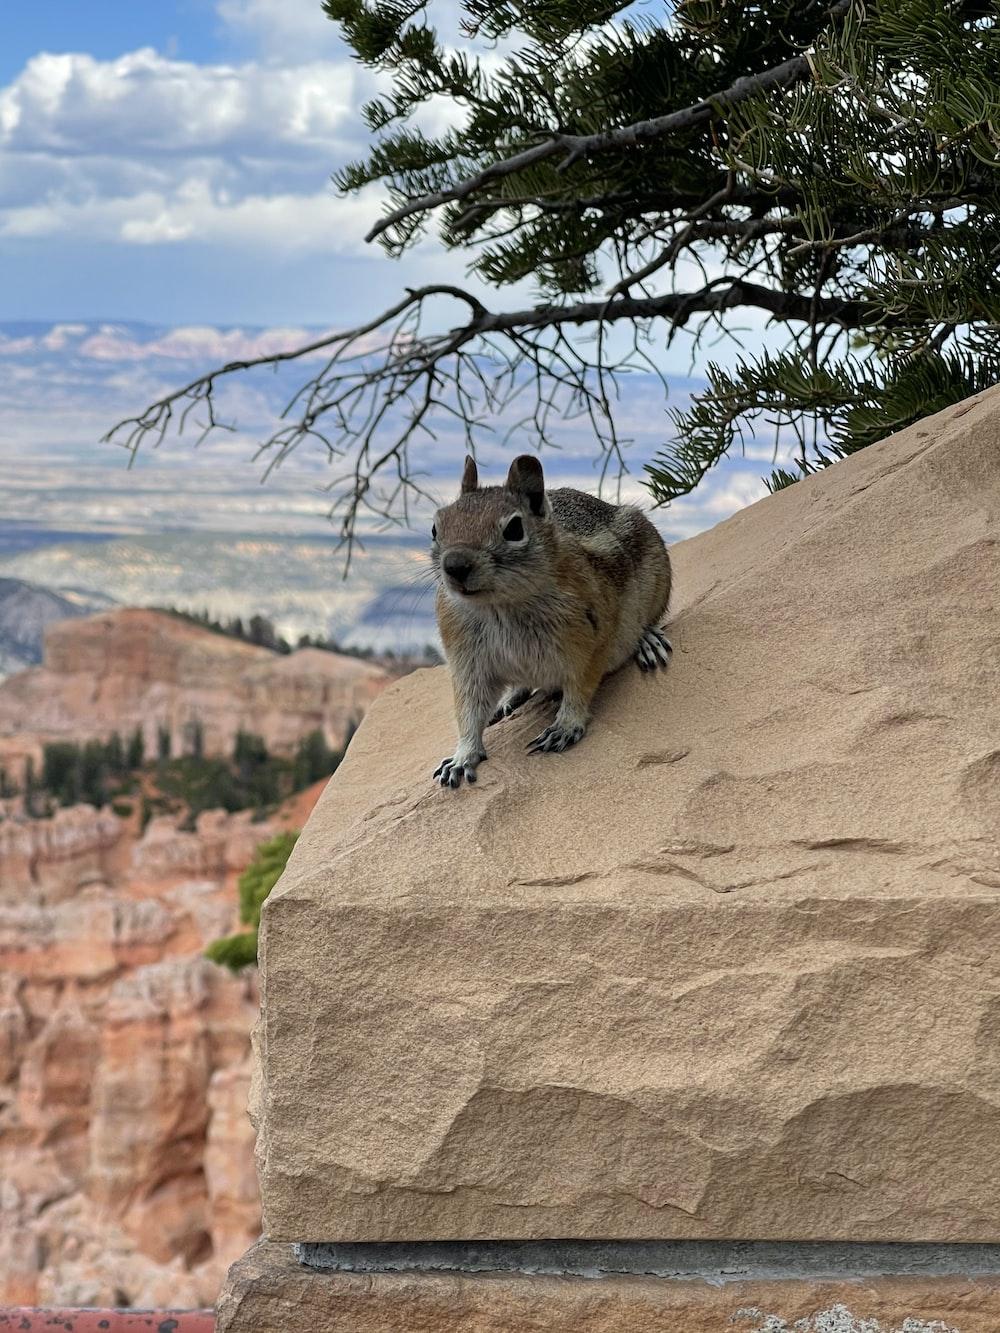 brown squirrel on brown rock during daytime